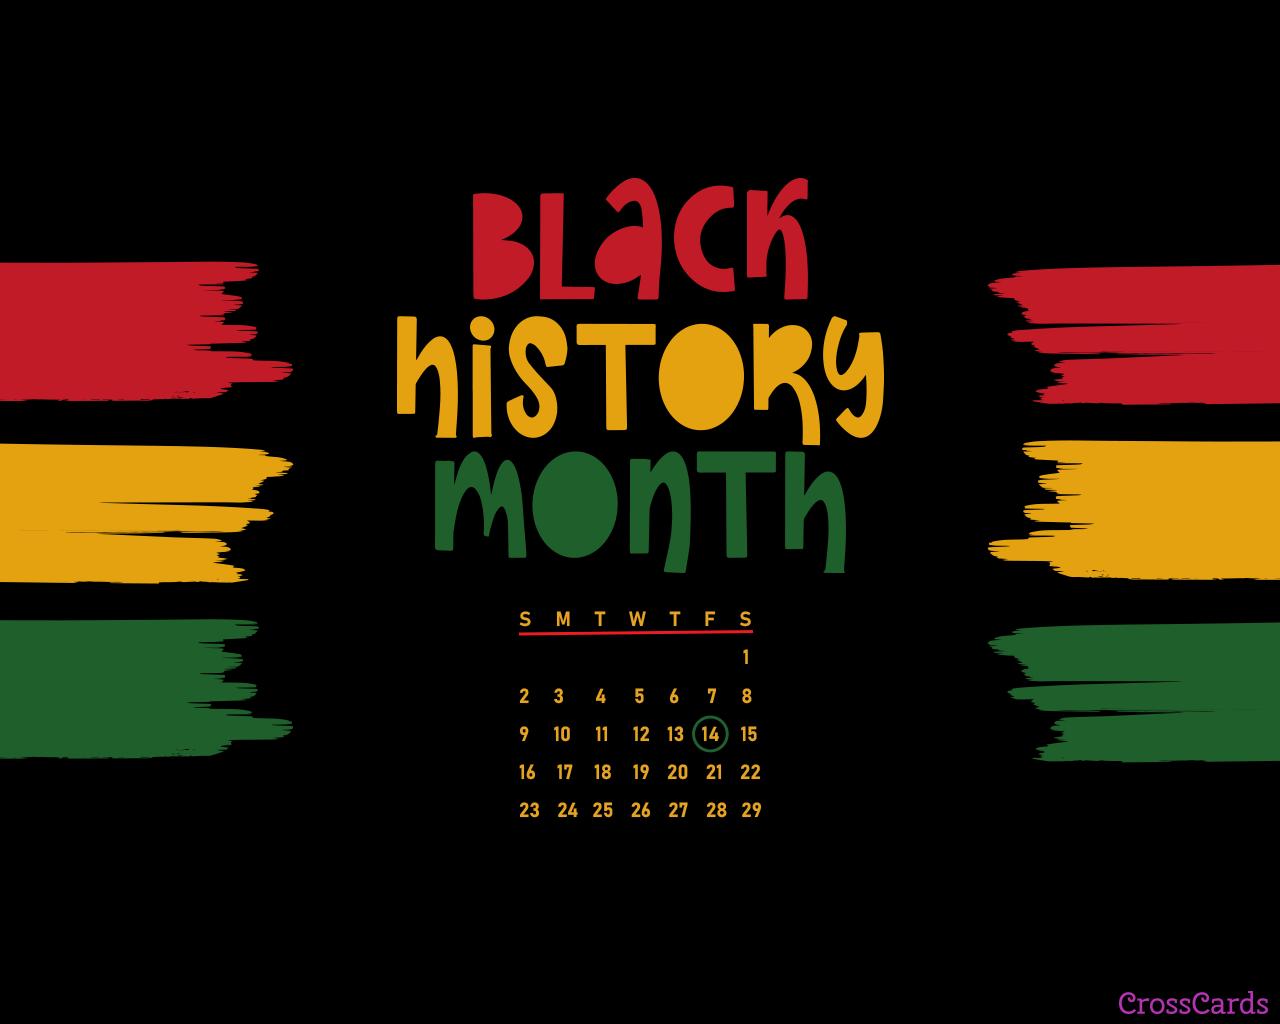 Black History Month - February 2021 Calendar